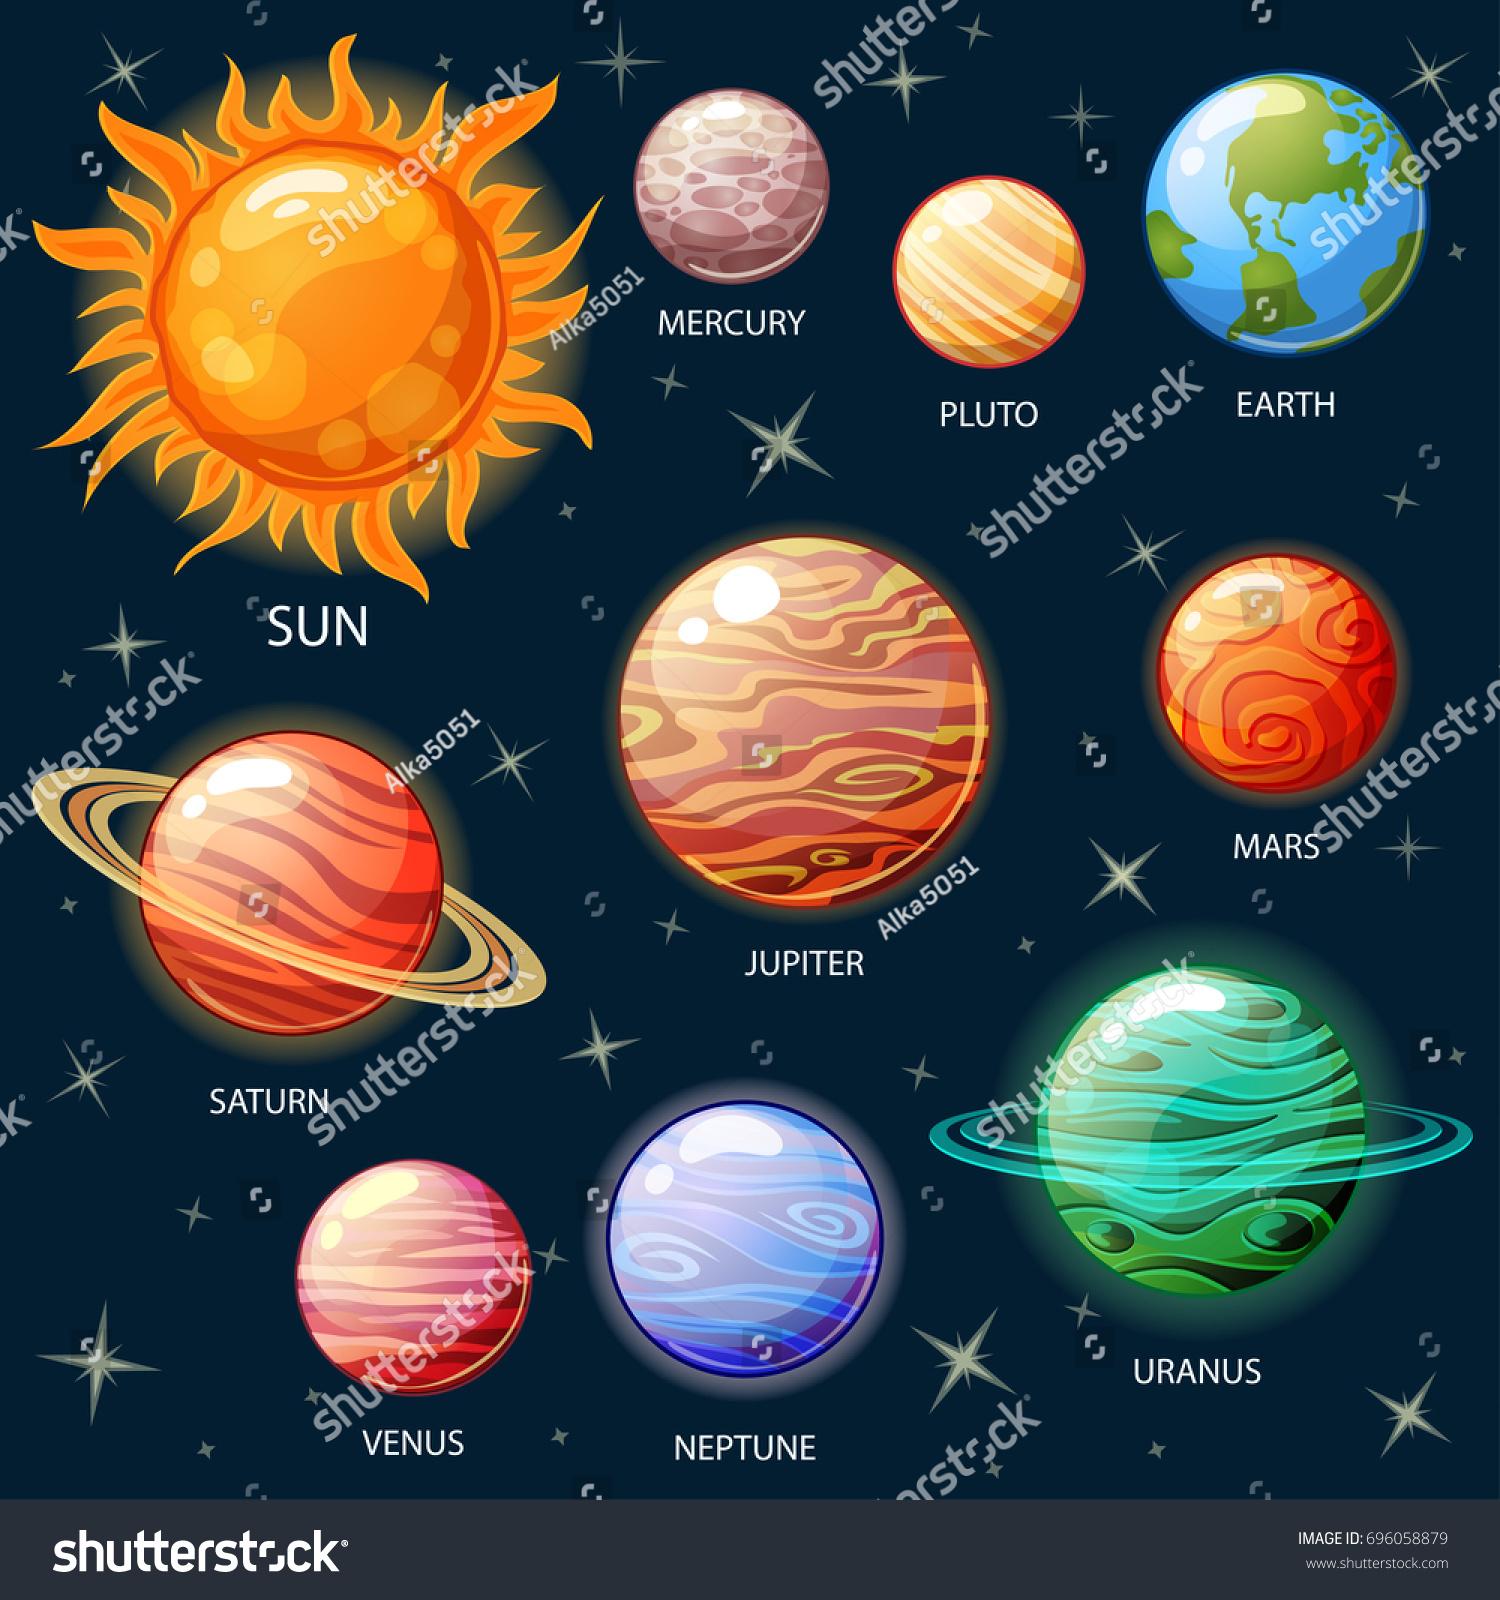 neptune the solar system jupiter - photo #4